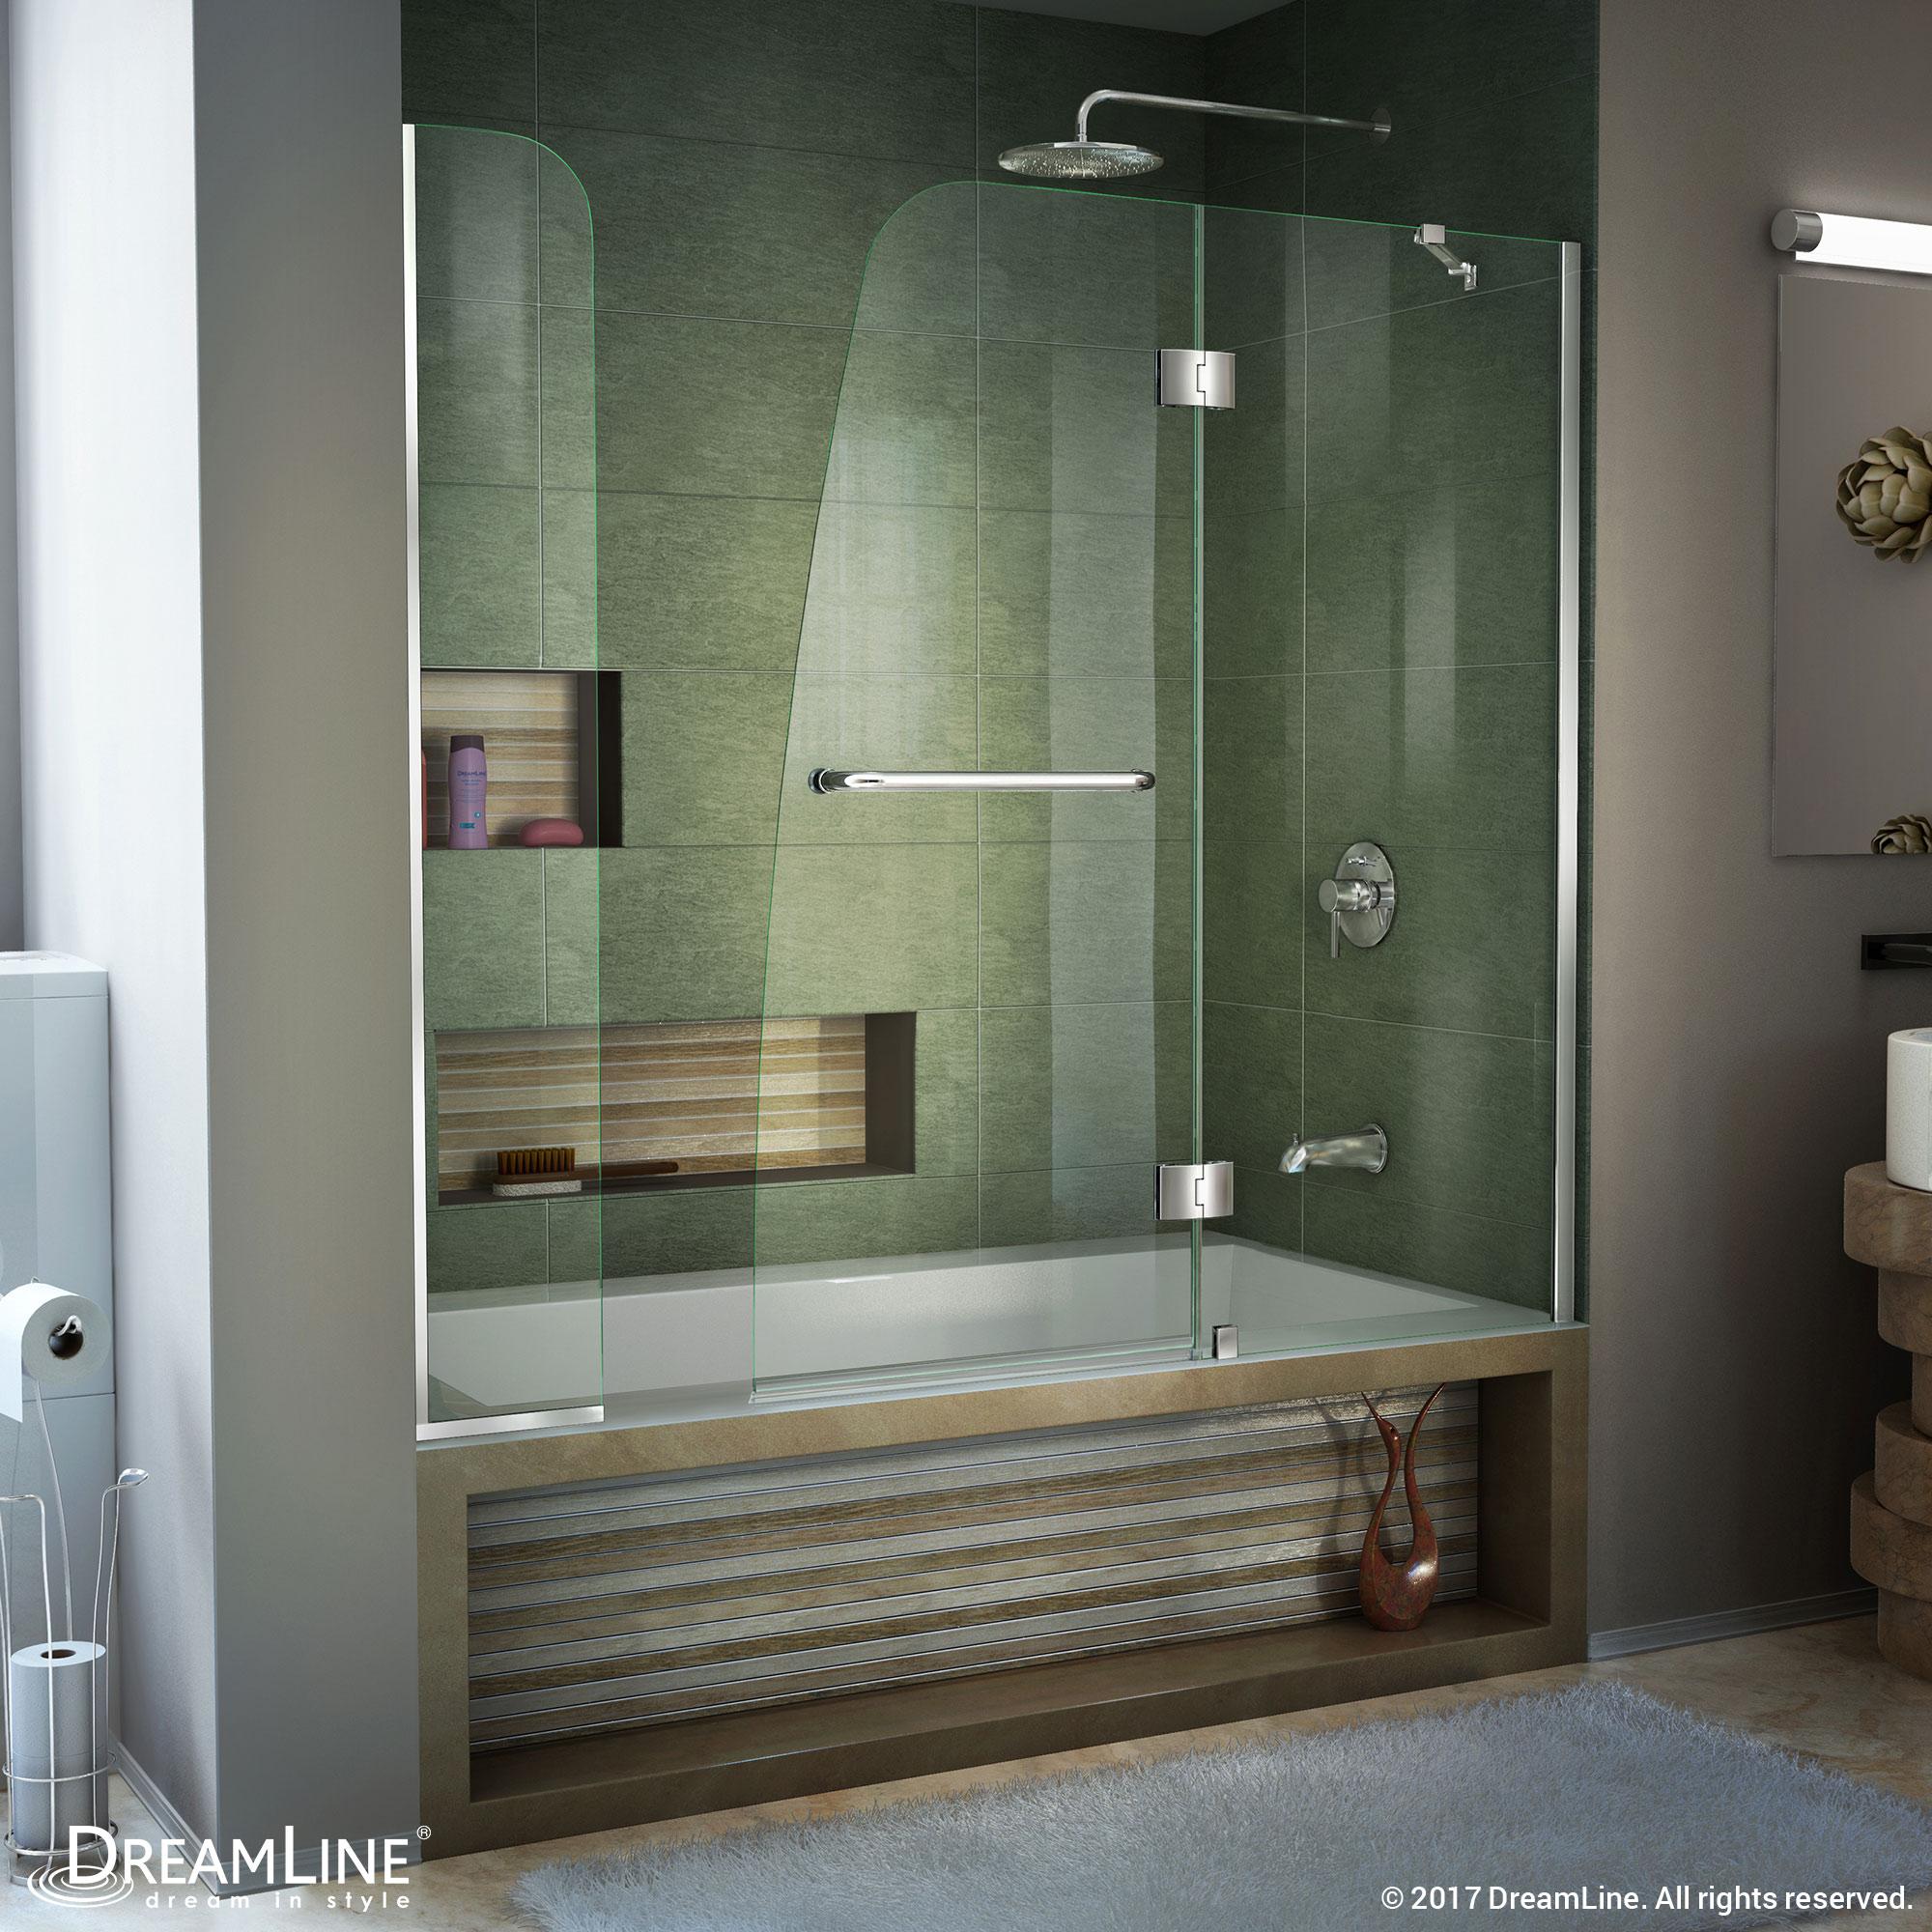 DreamLine Aqua 48 in. W x 58 in. H Frameless Hinged Tub Door in Chrome